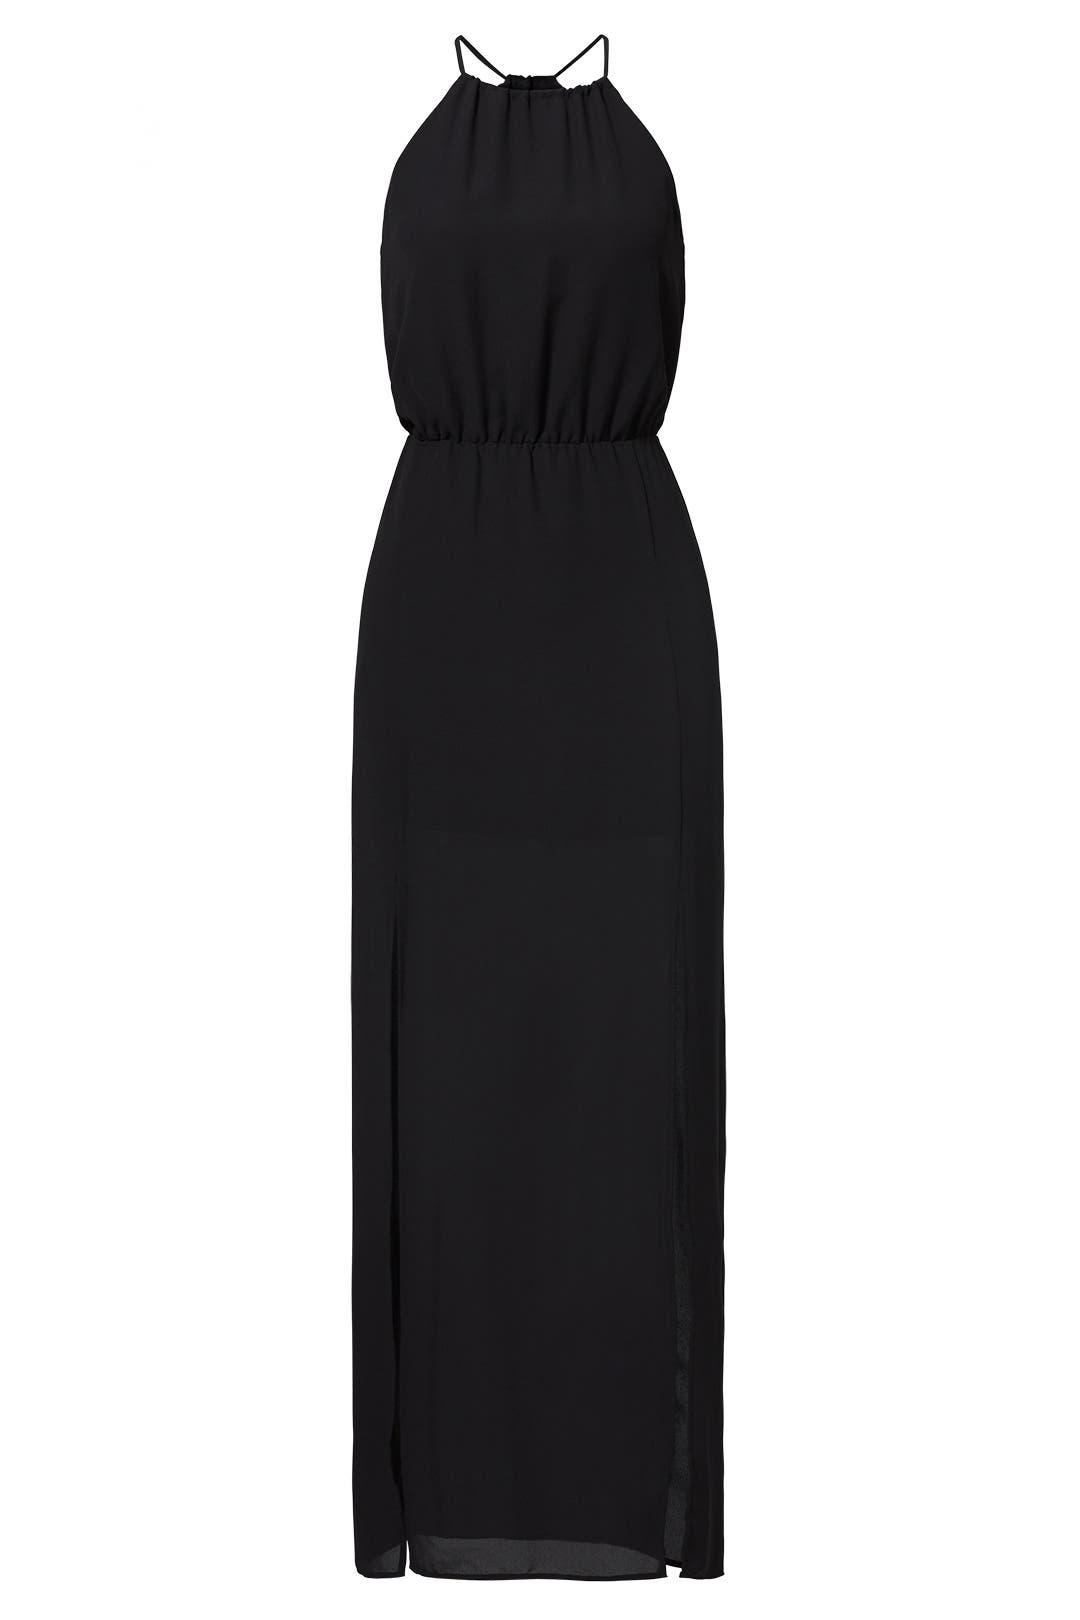 Bcbg maxi dress black and white party